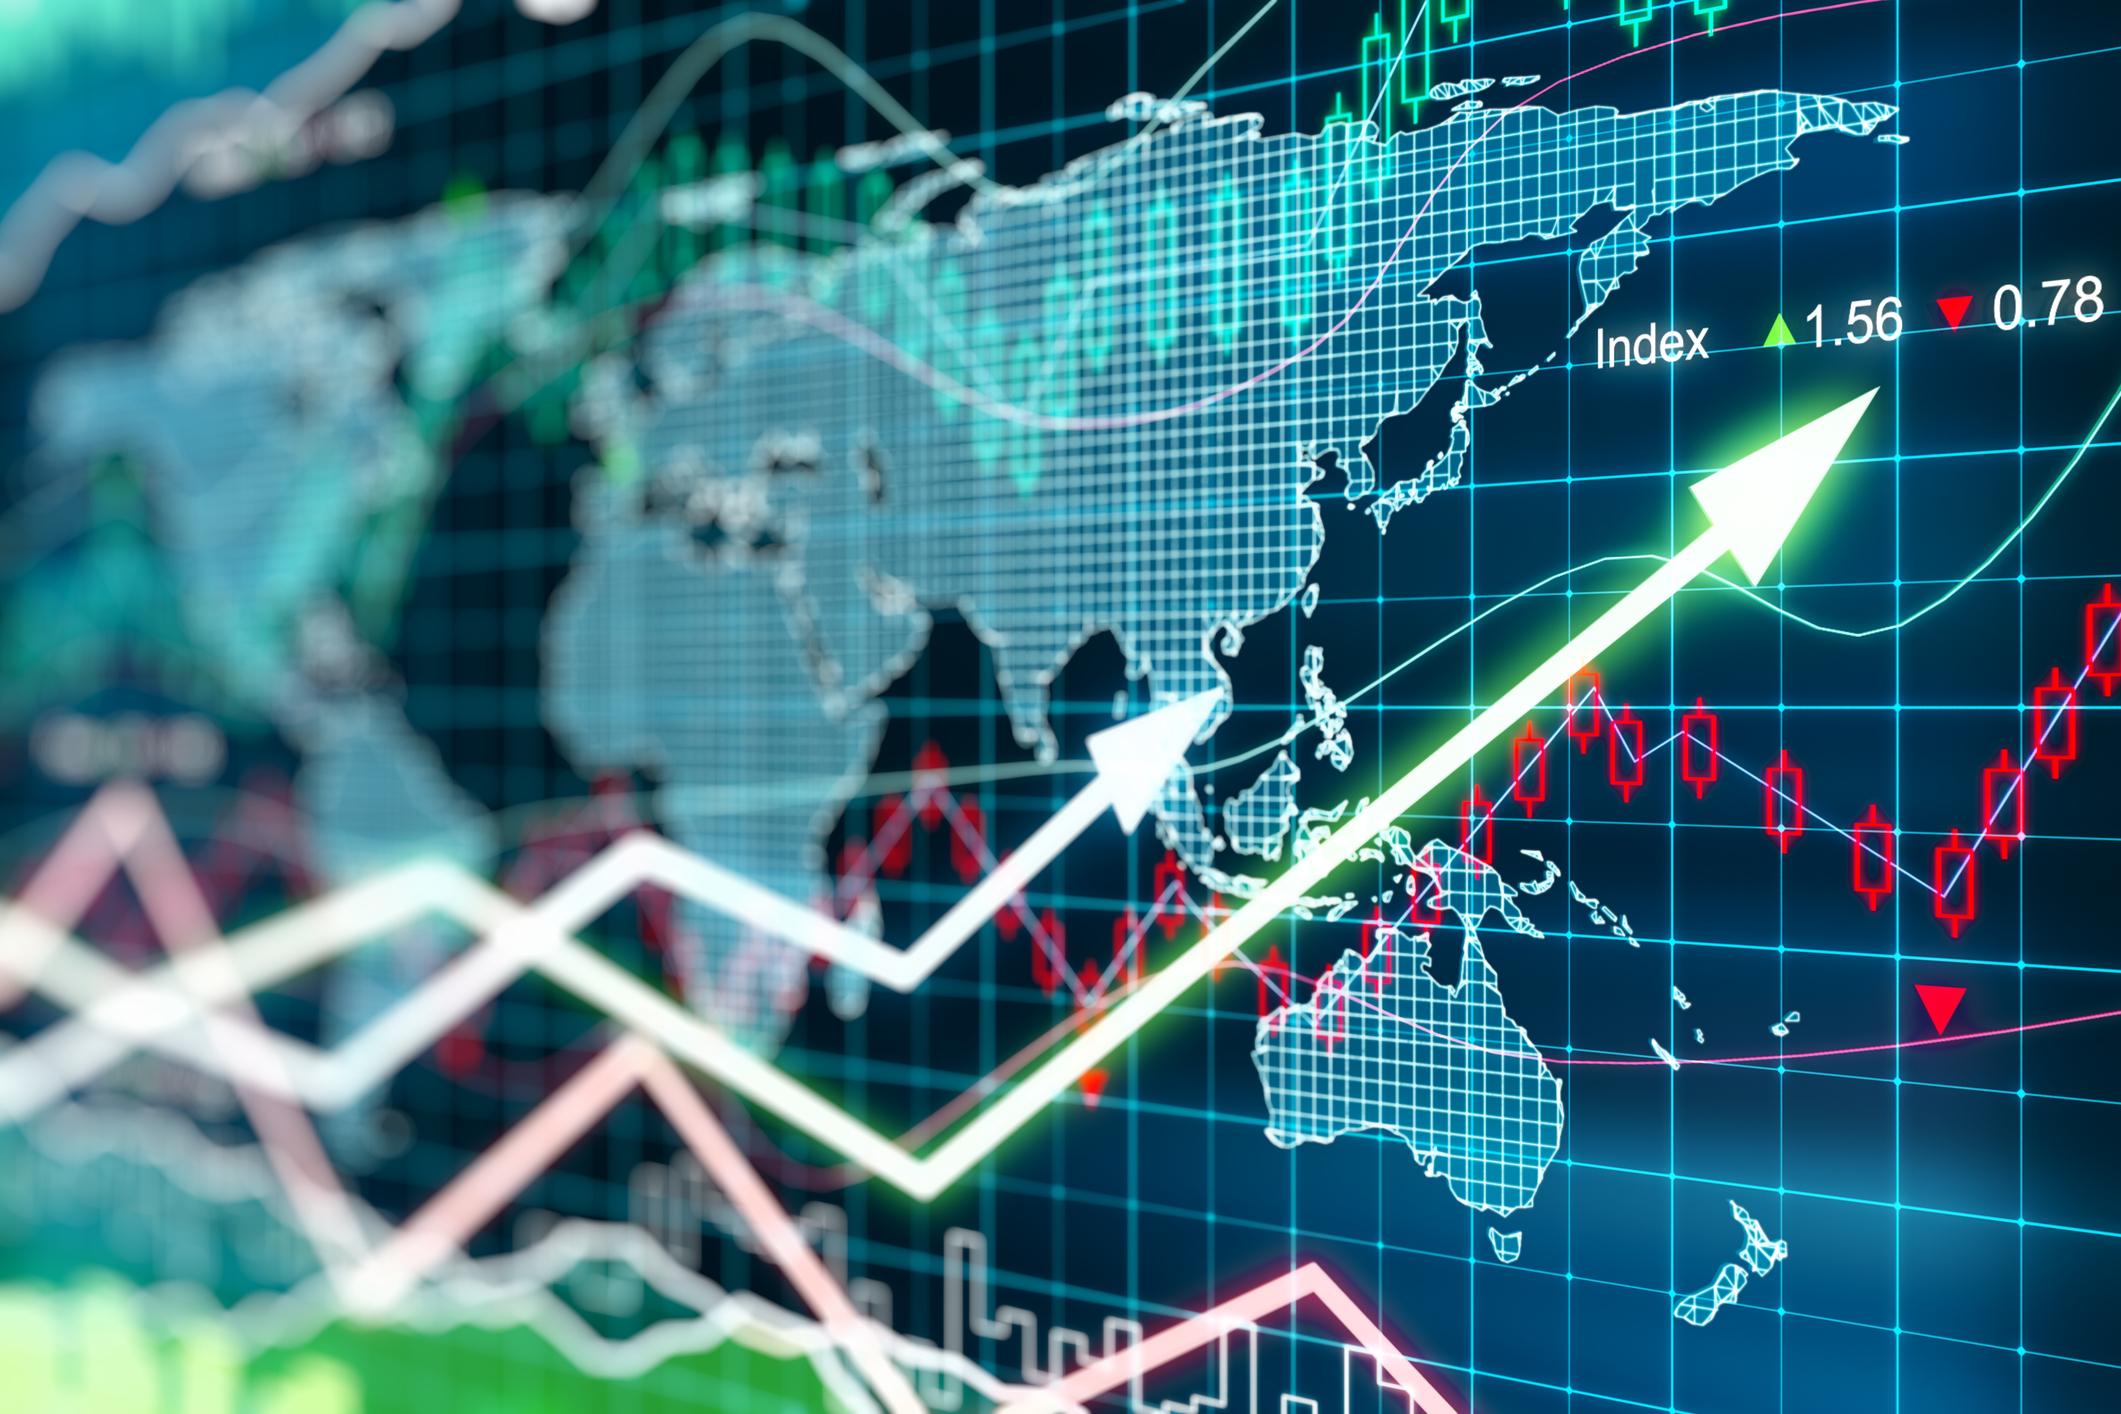 Rising stock market charts overlaying a world map